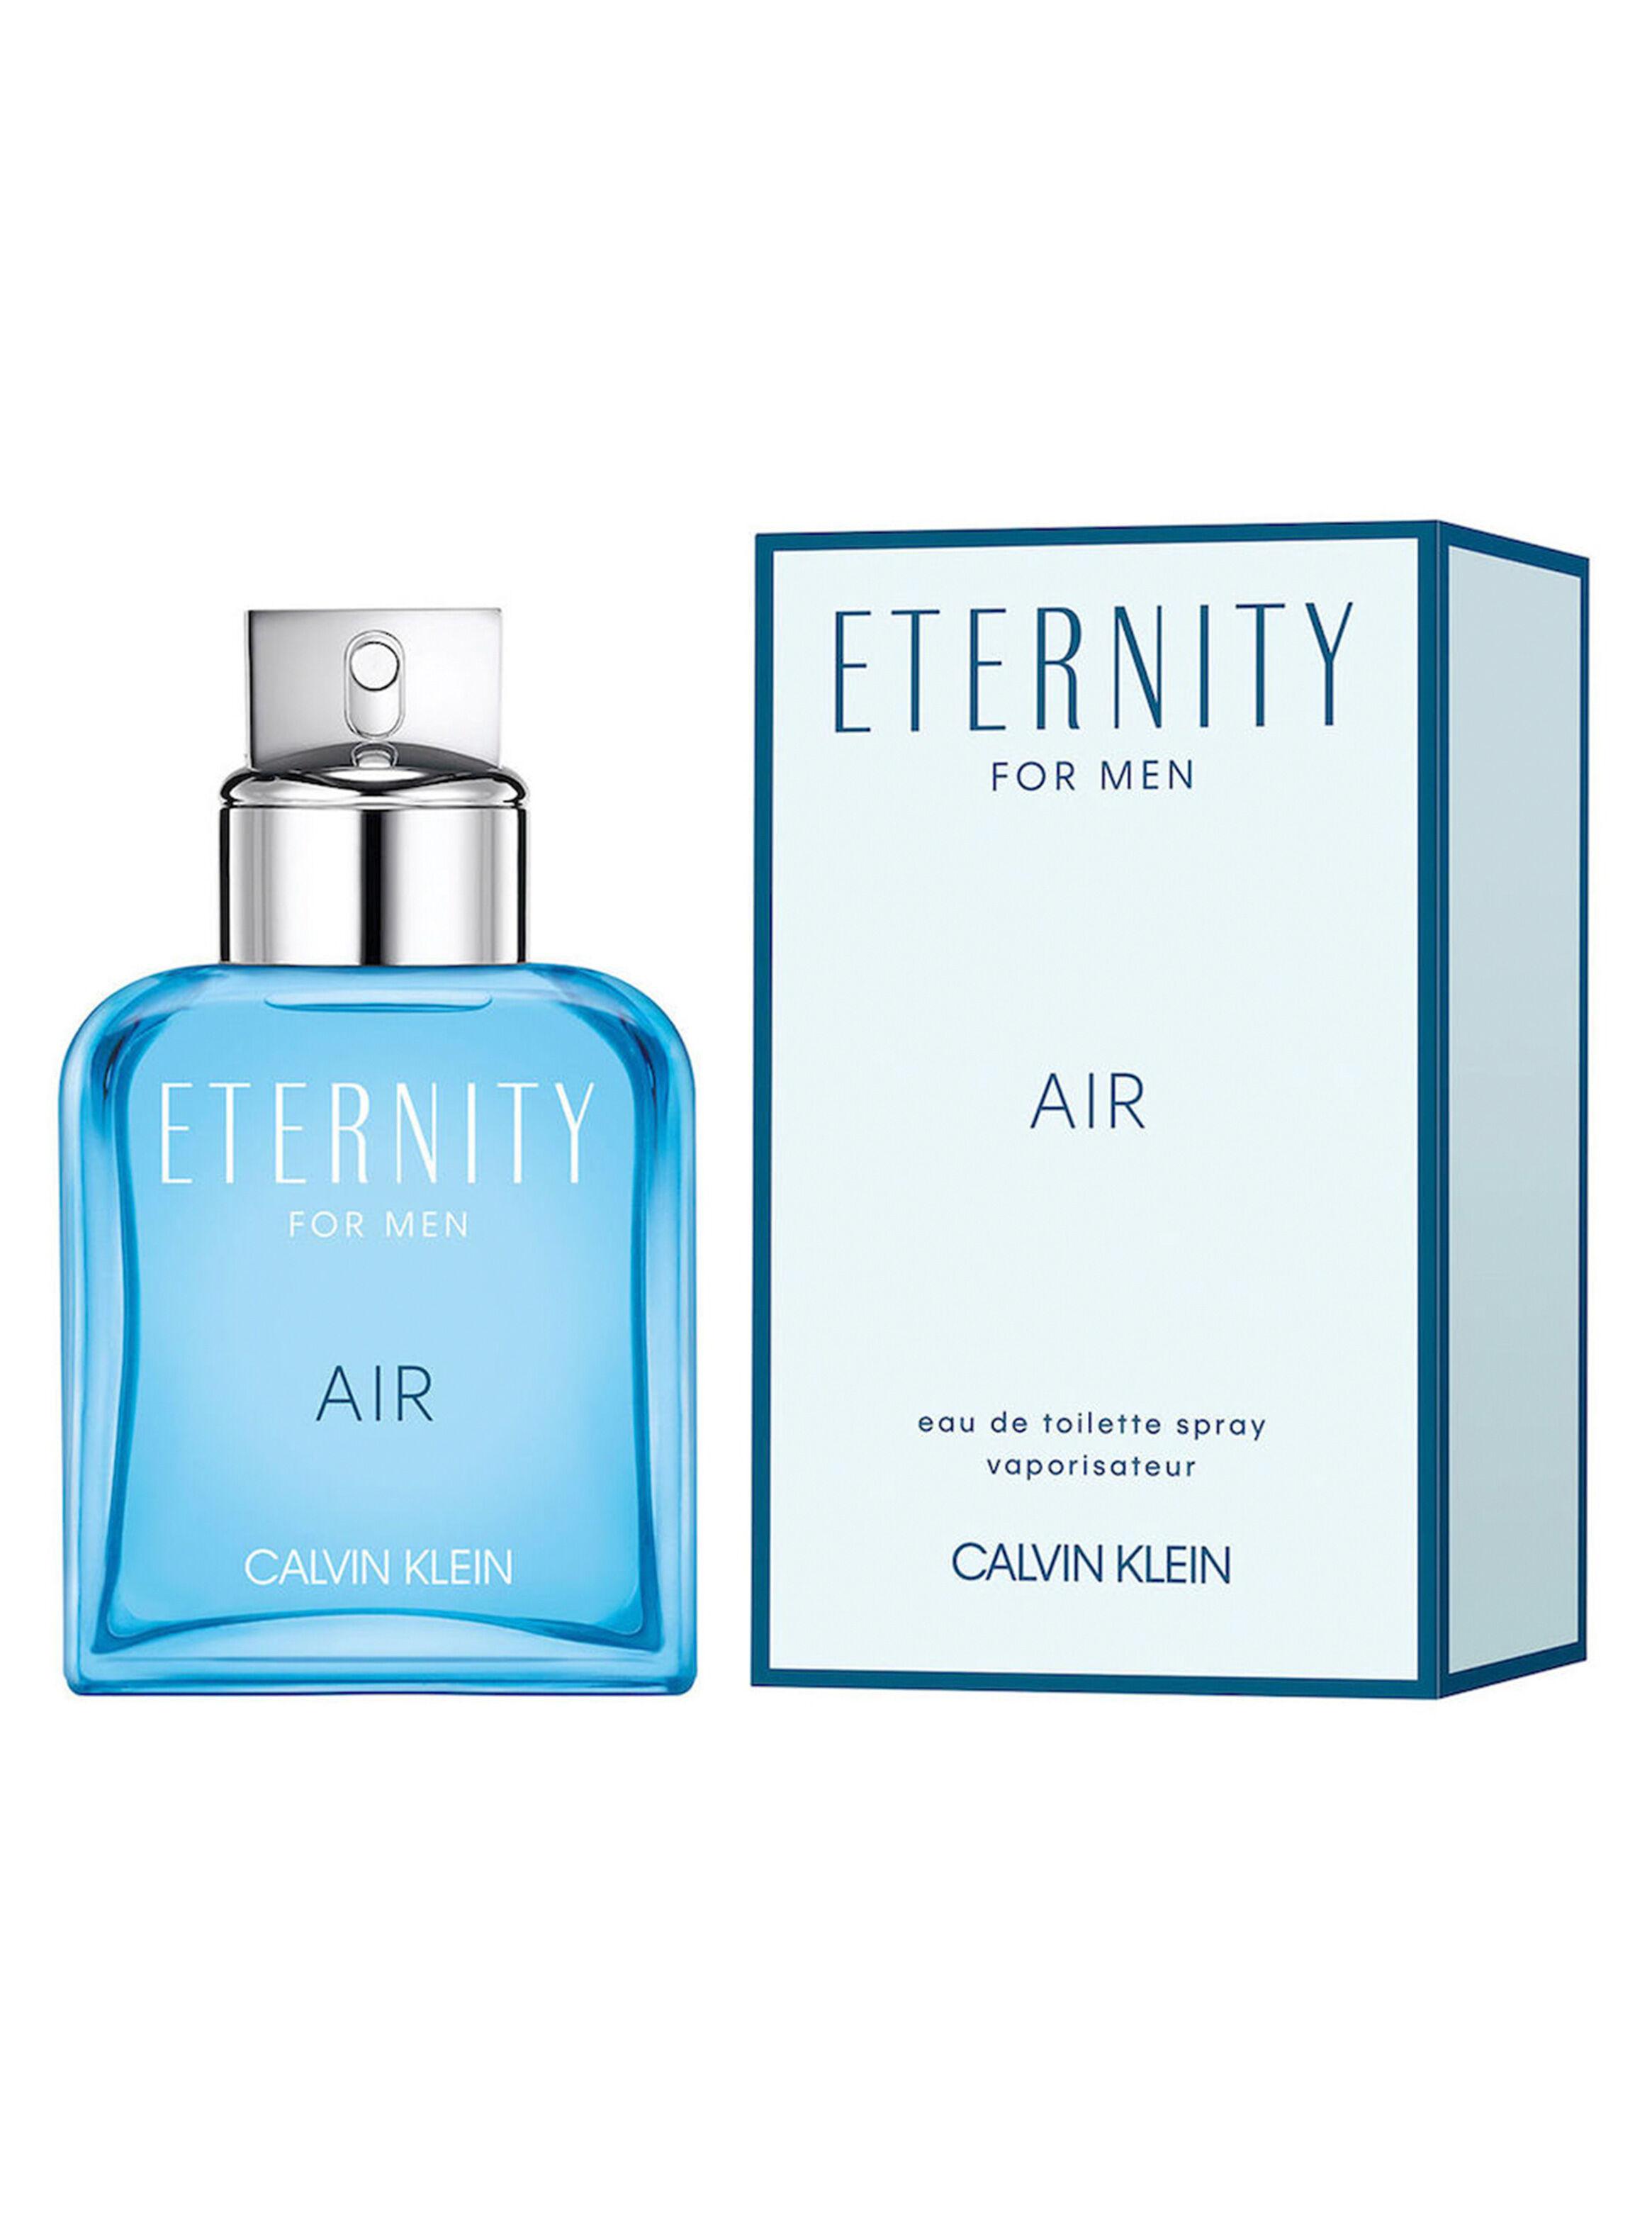 Perfume For Ml Klein Air En Perfumes Eternity Edt 30 Calvin Men PkOXuTZi